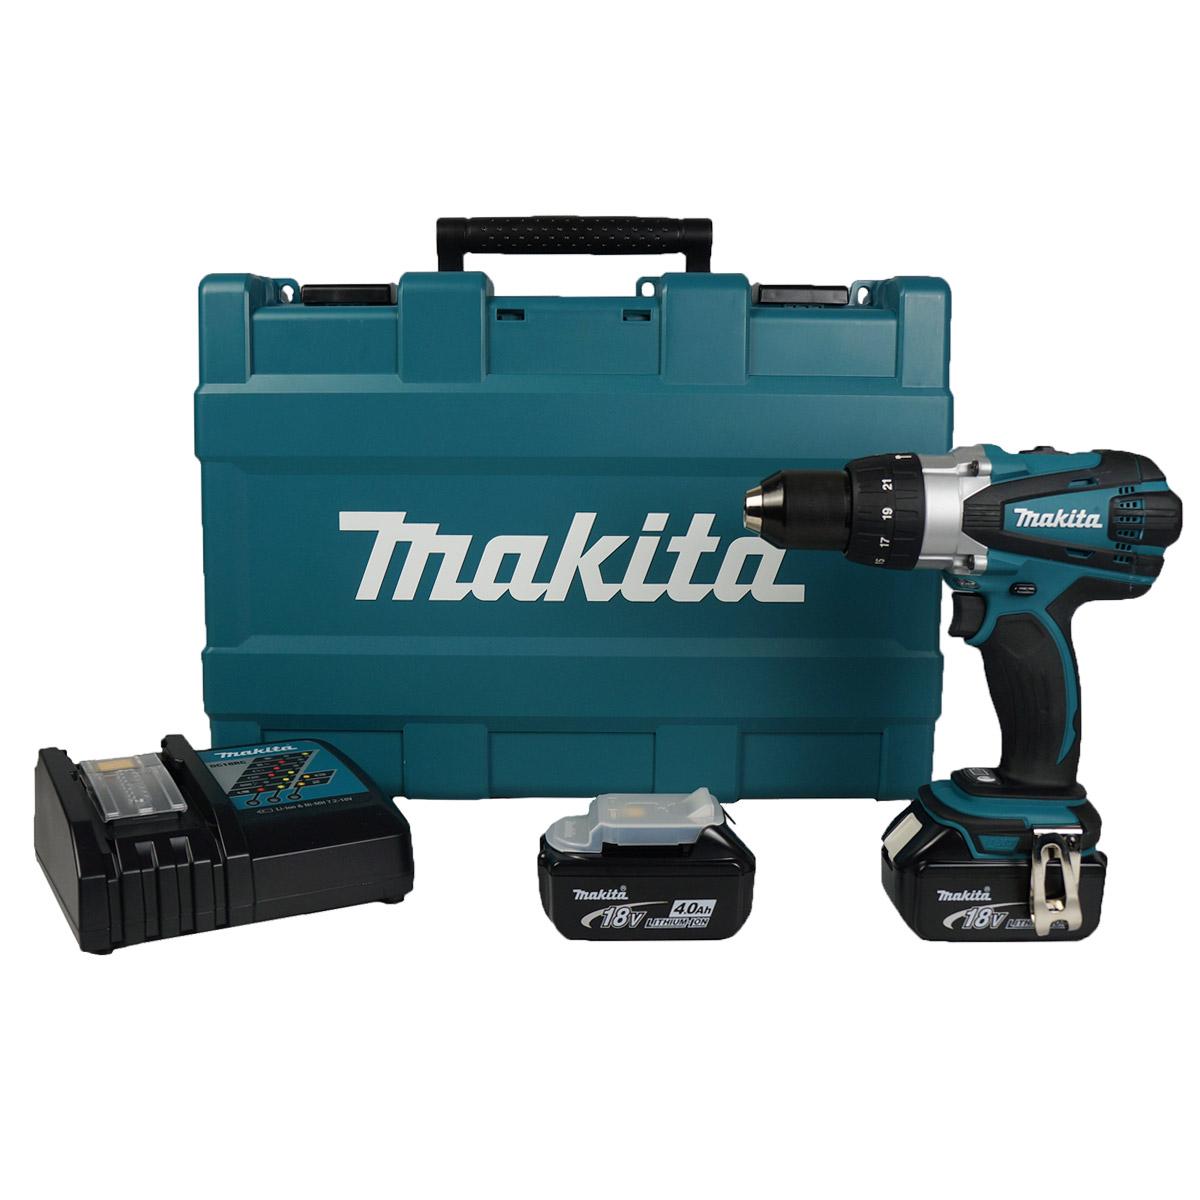 makita dhp458rme 18v cordless li ion compact 2 speed combi. Black Bedroom Furniture Sets. Home Design Ideas